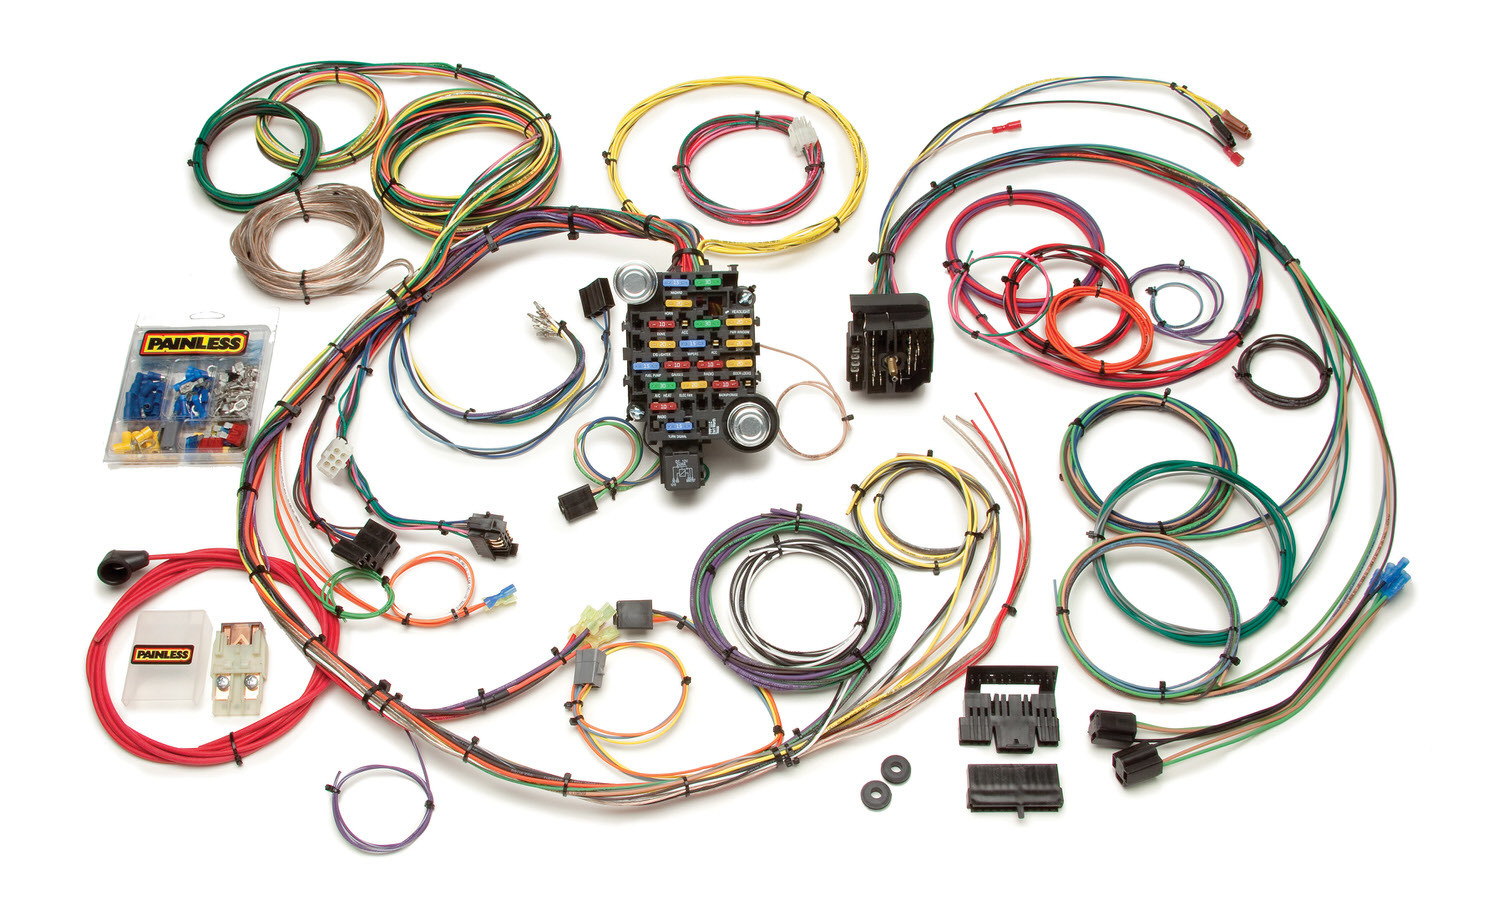 Painless Wiring 24 Circuit 67-68 Camaro/ Firebird Harness